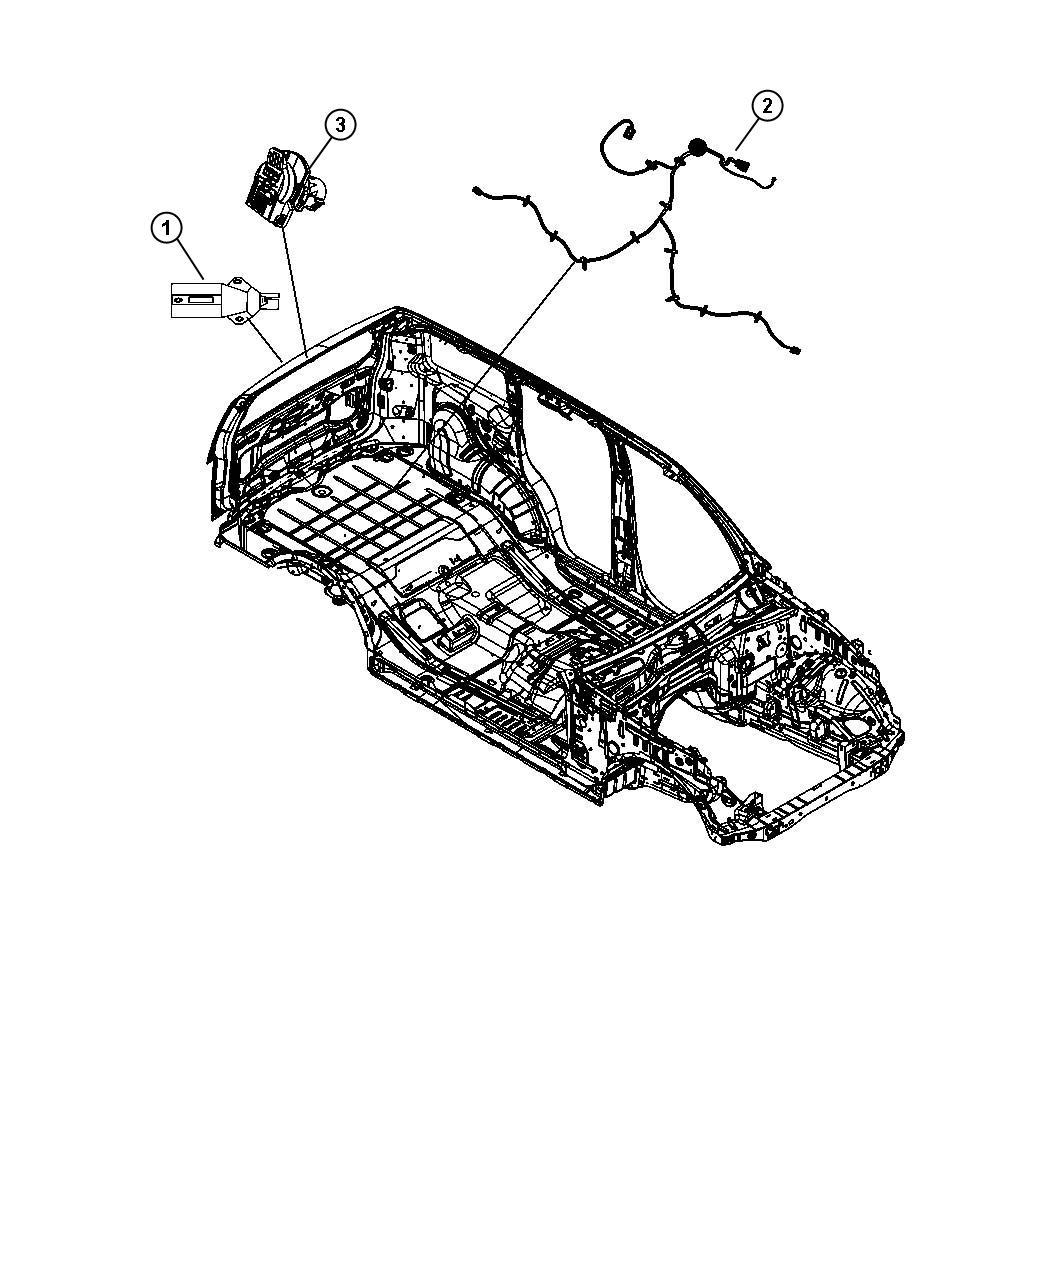 Dodge Nitro Wiring Fuel Tank Gallon Plate Skid